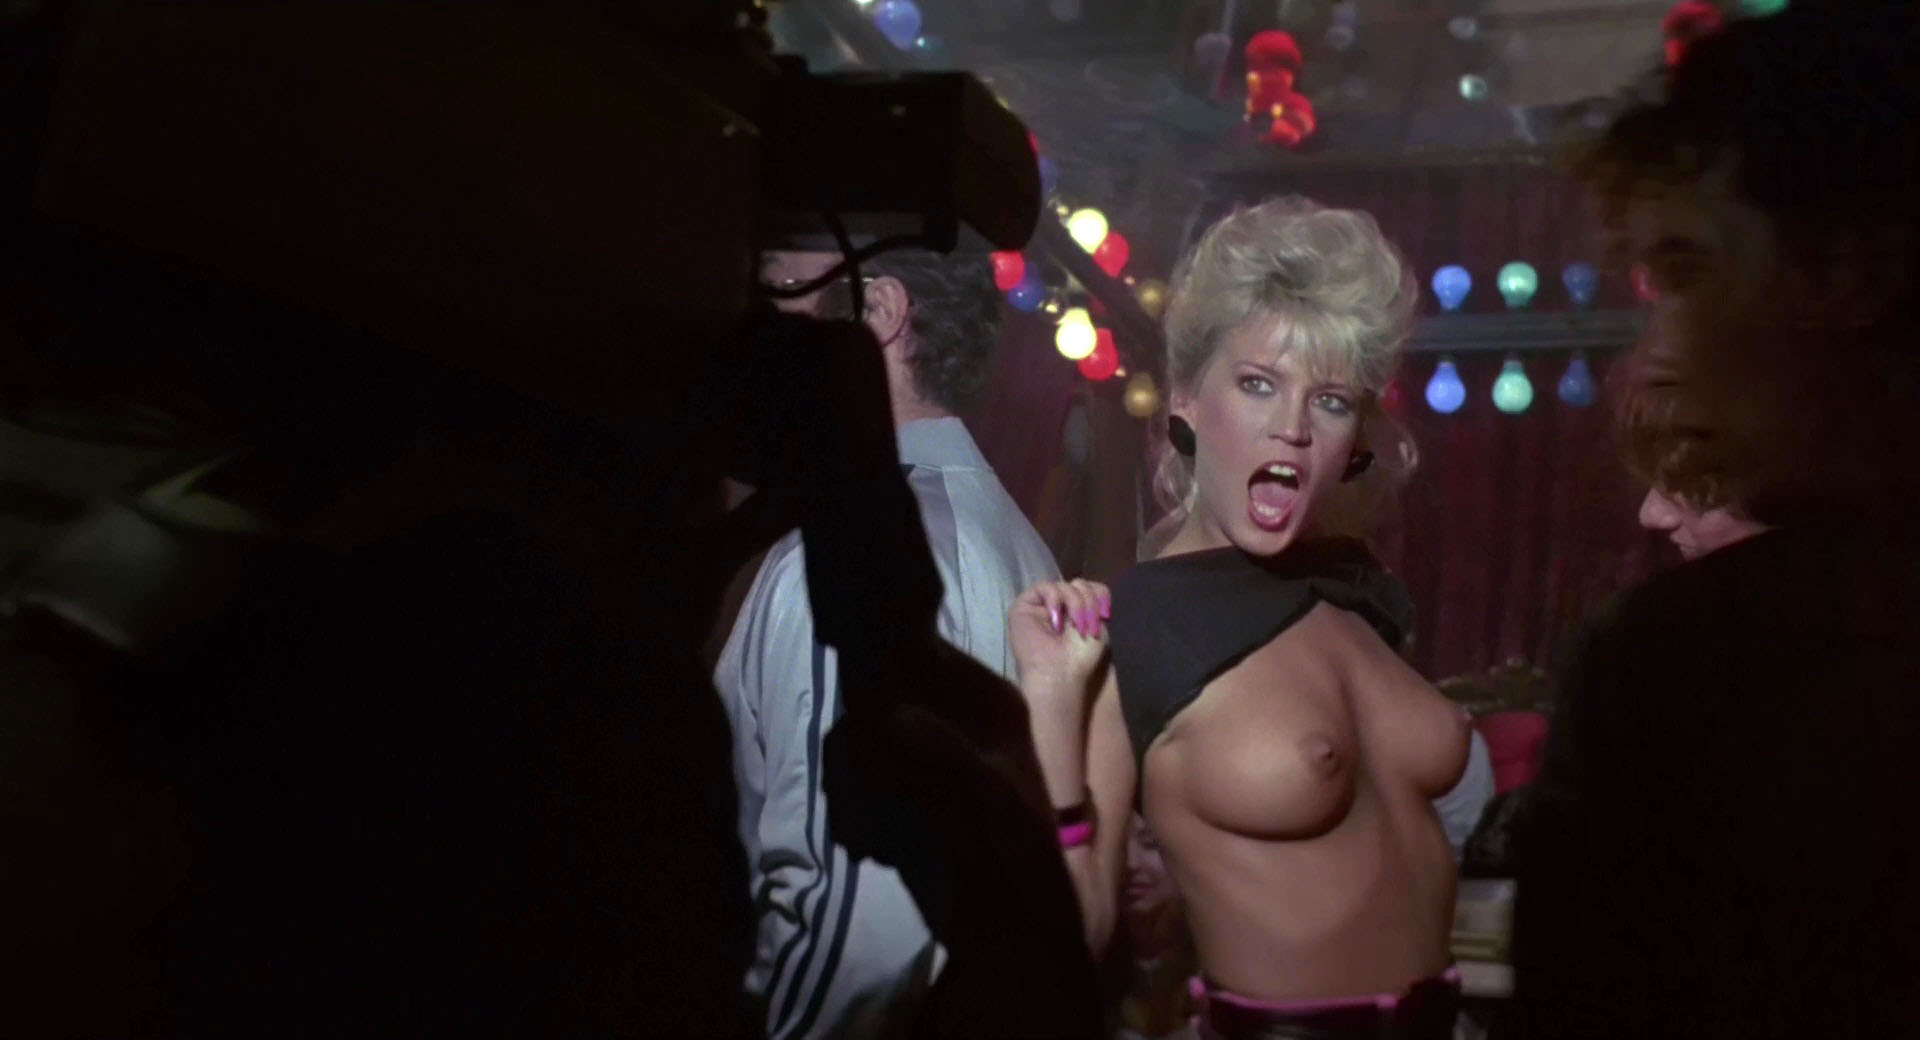 Amber Lynn Free Pics amber lynn – 52 pick nude » celebs nude video